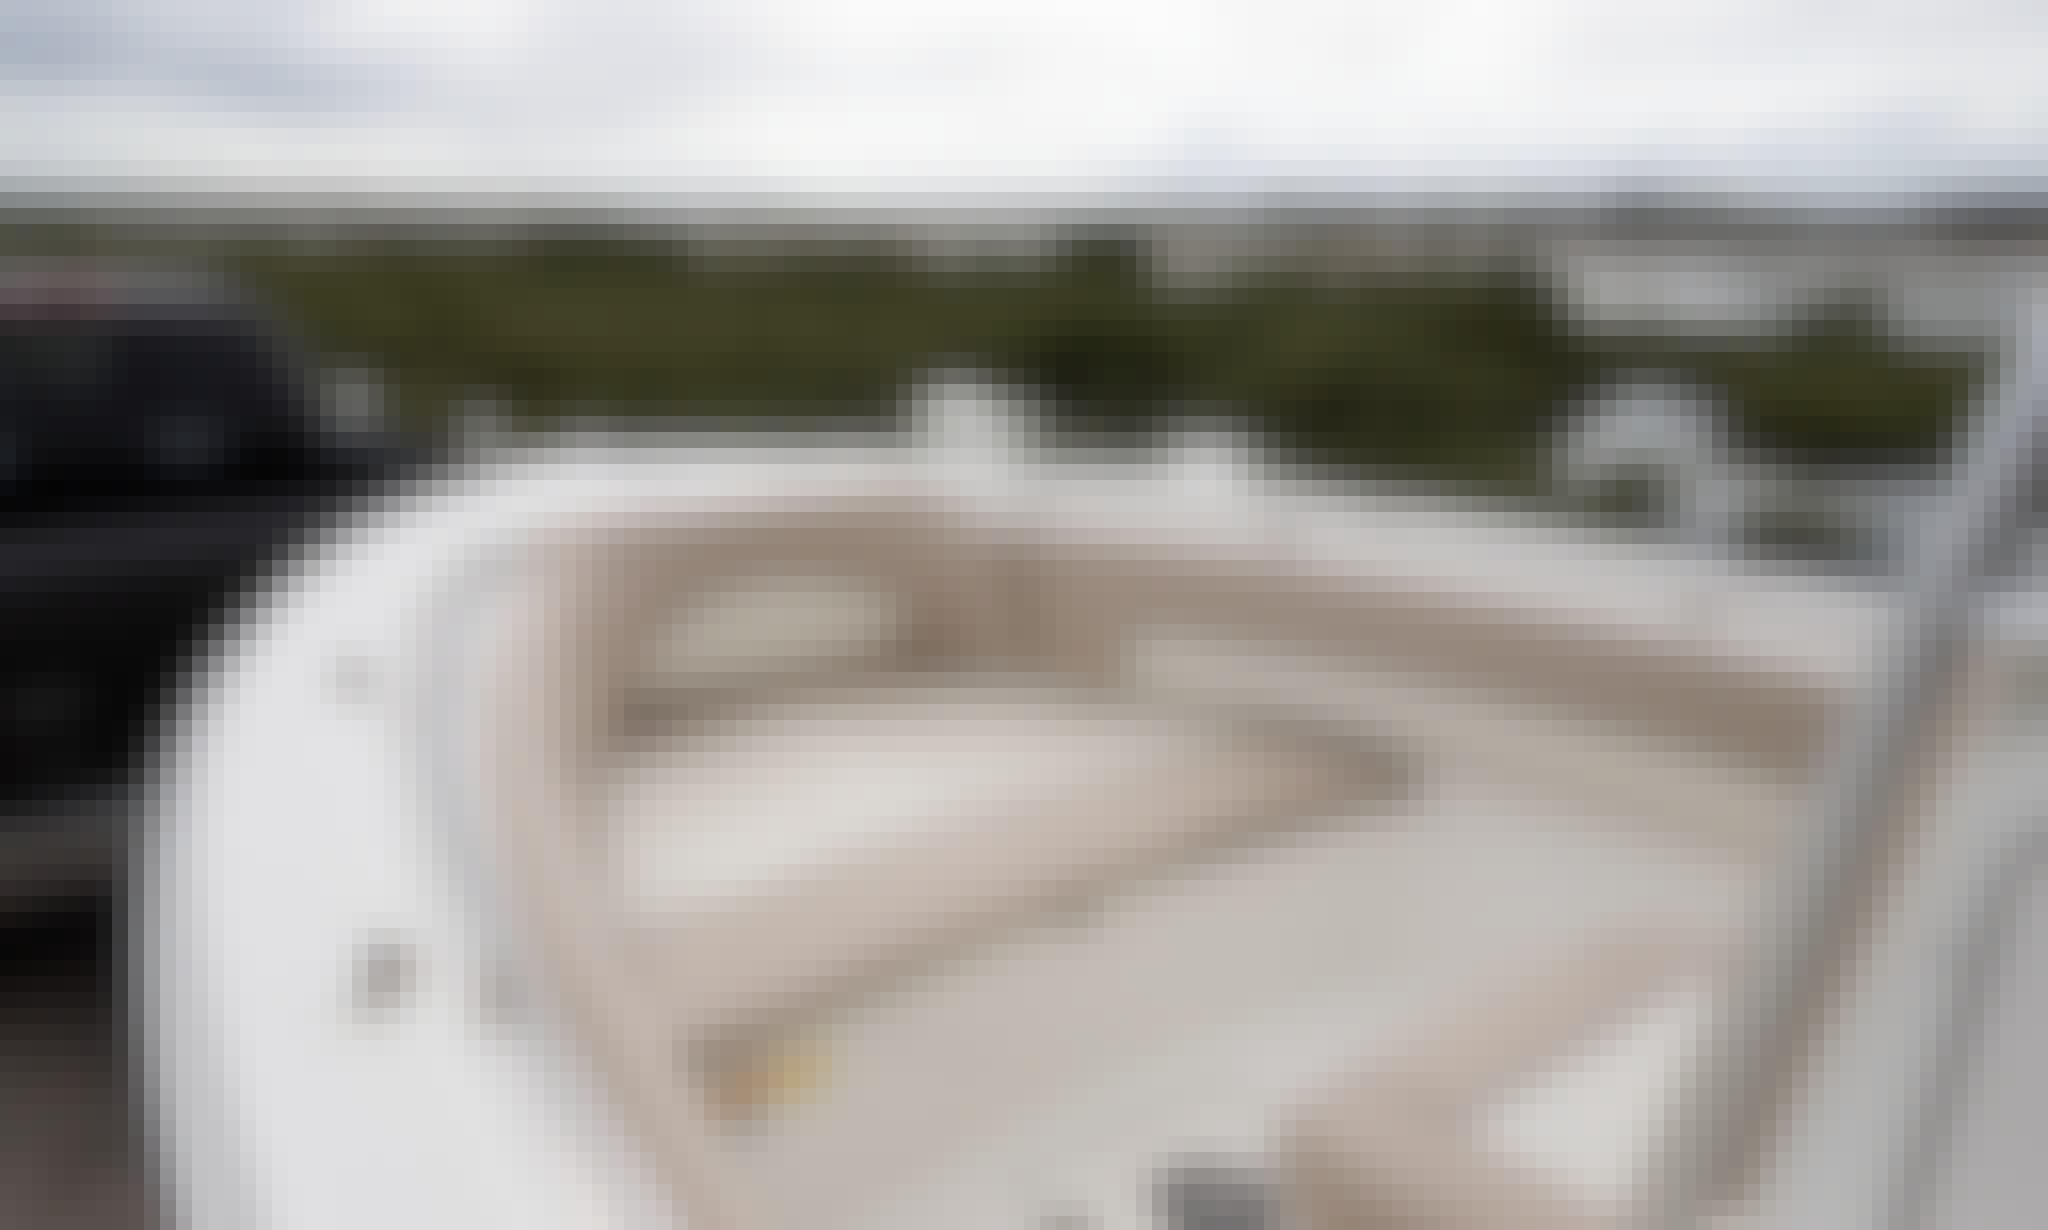 NauticStar 20' 150HP in Beautiful Florida